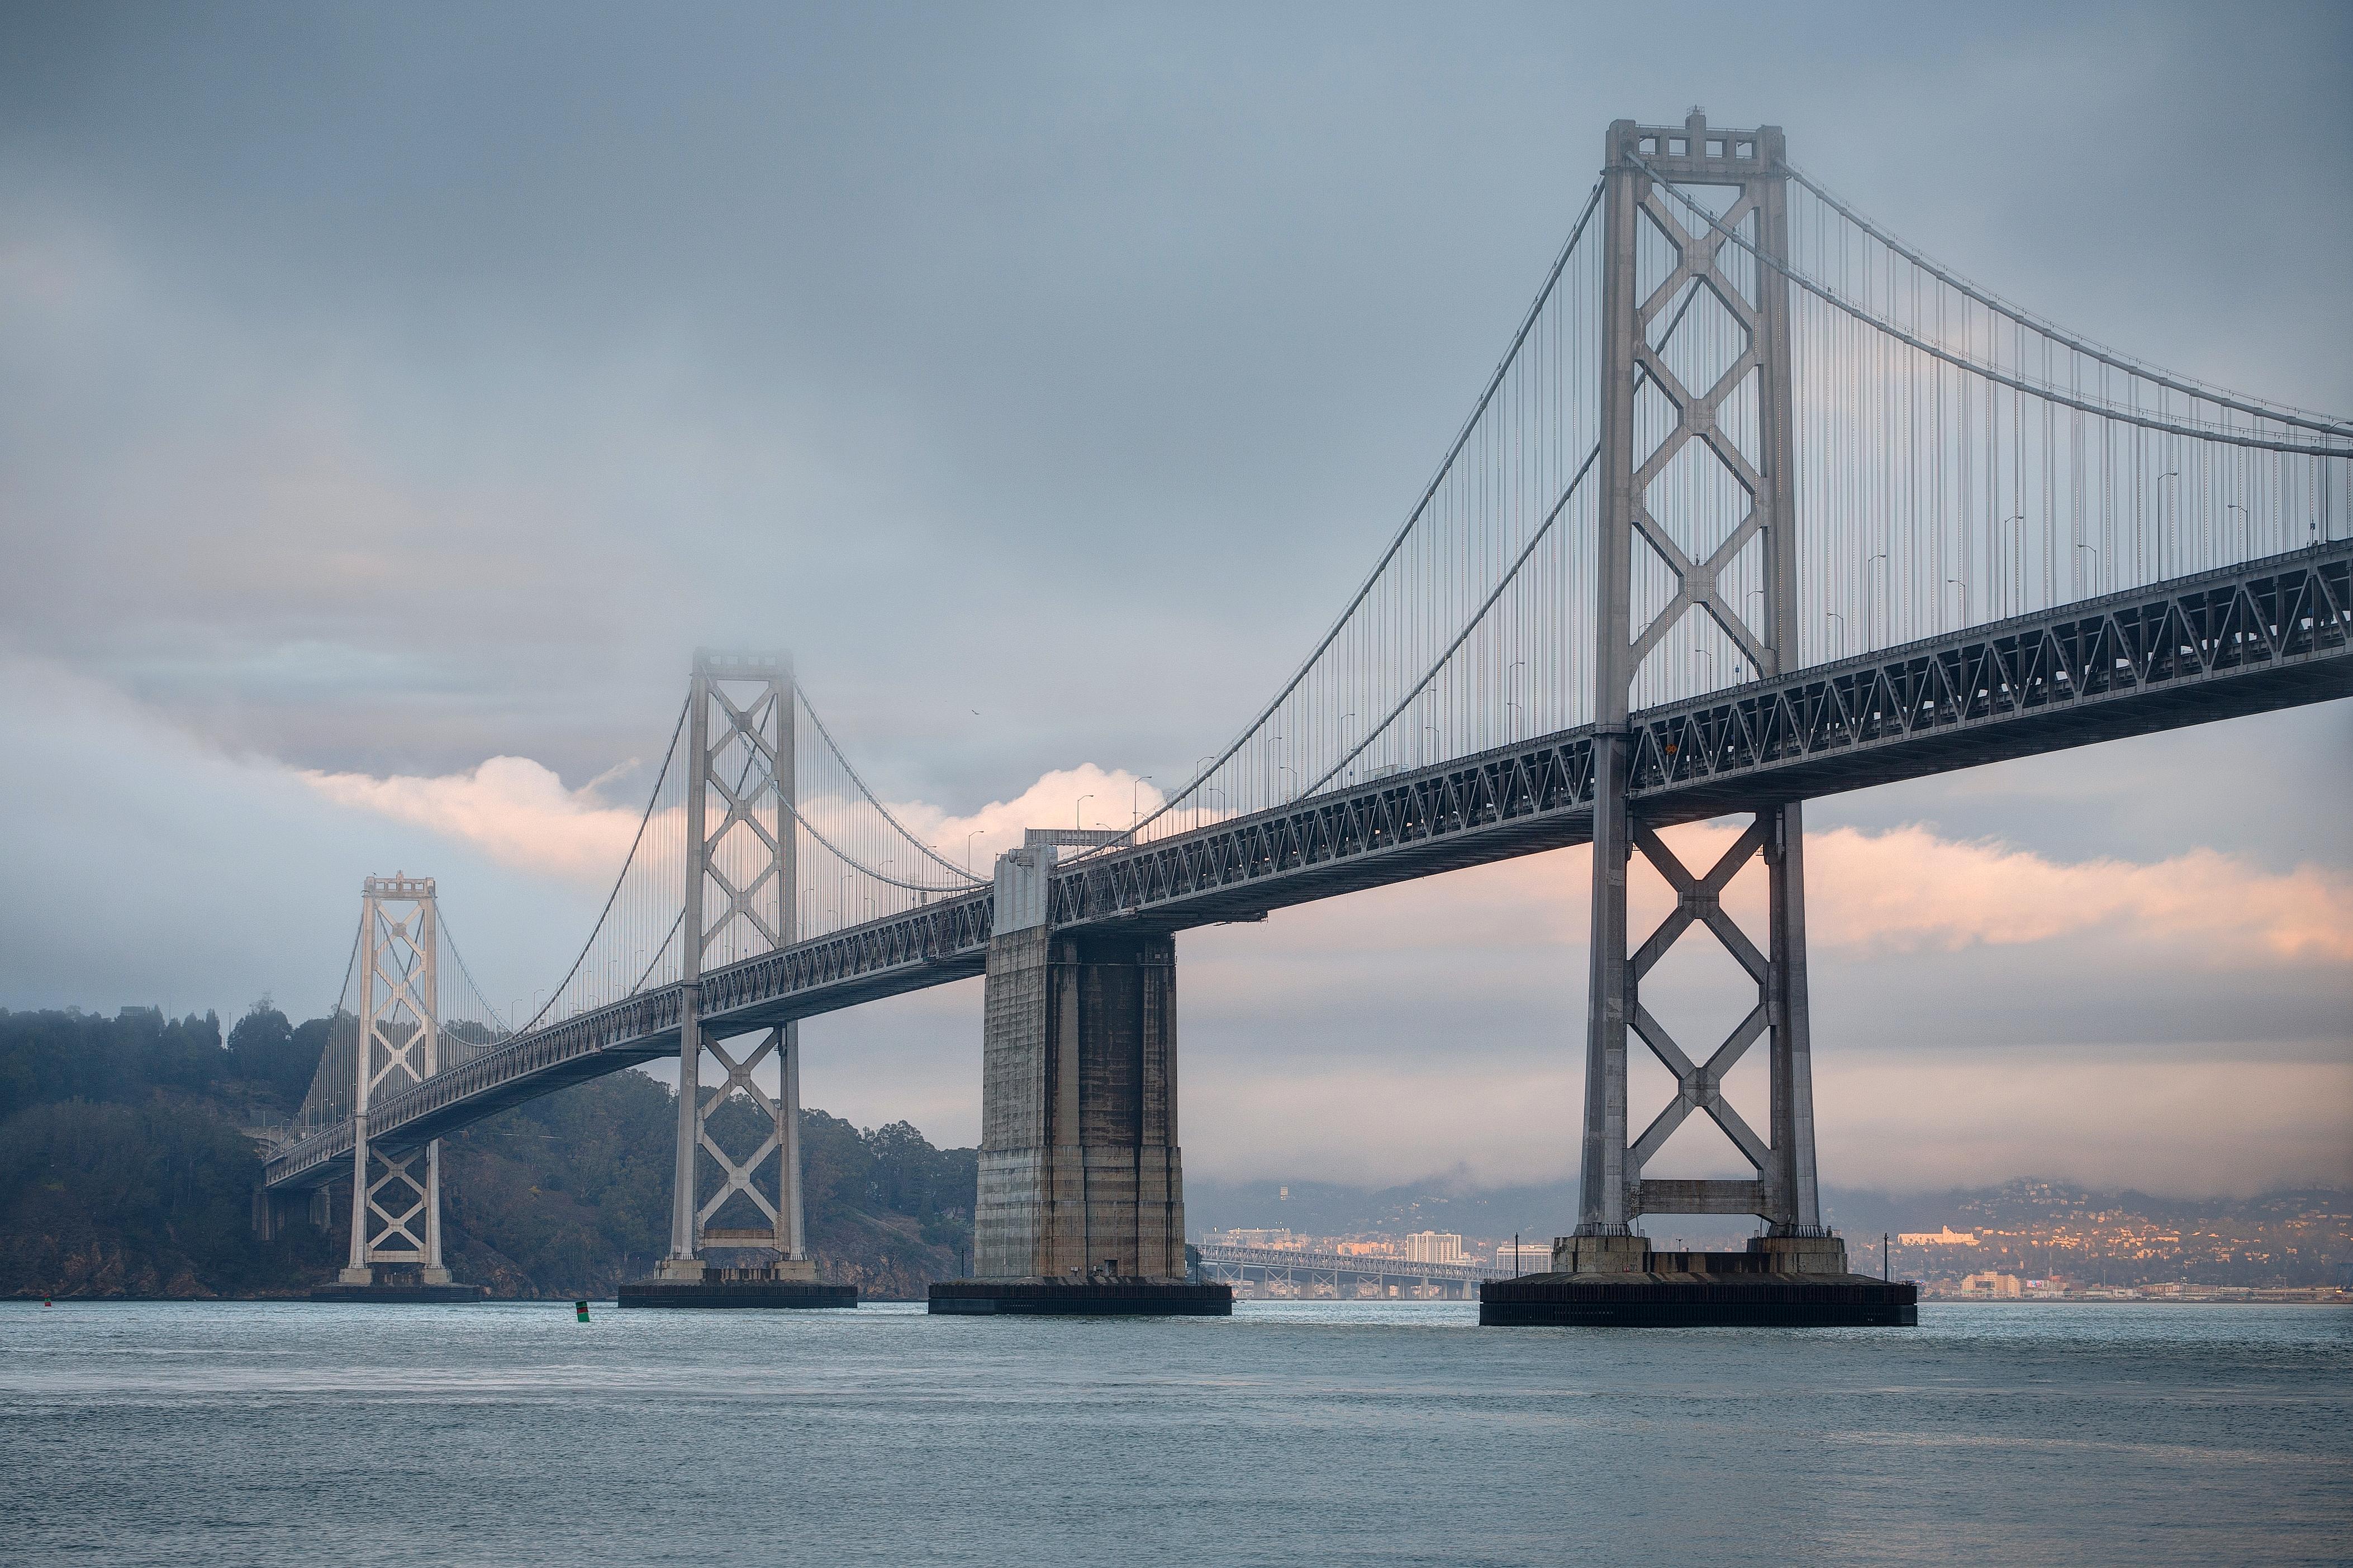 Amazing Bridge Pictures & Backgrounds